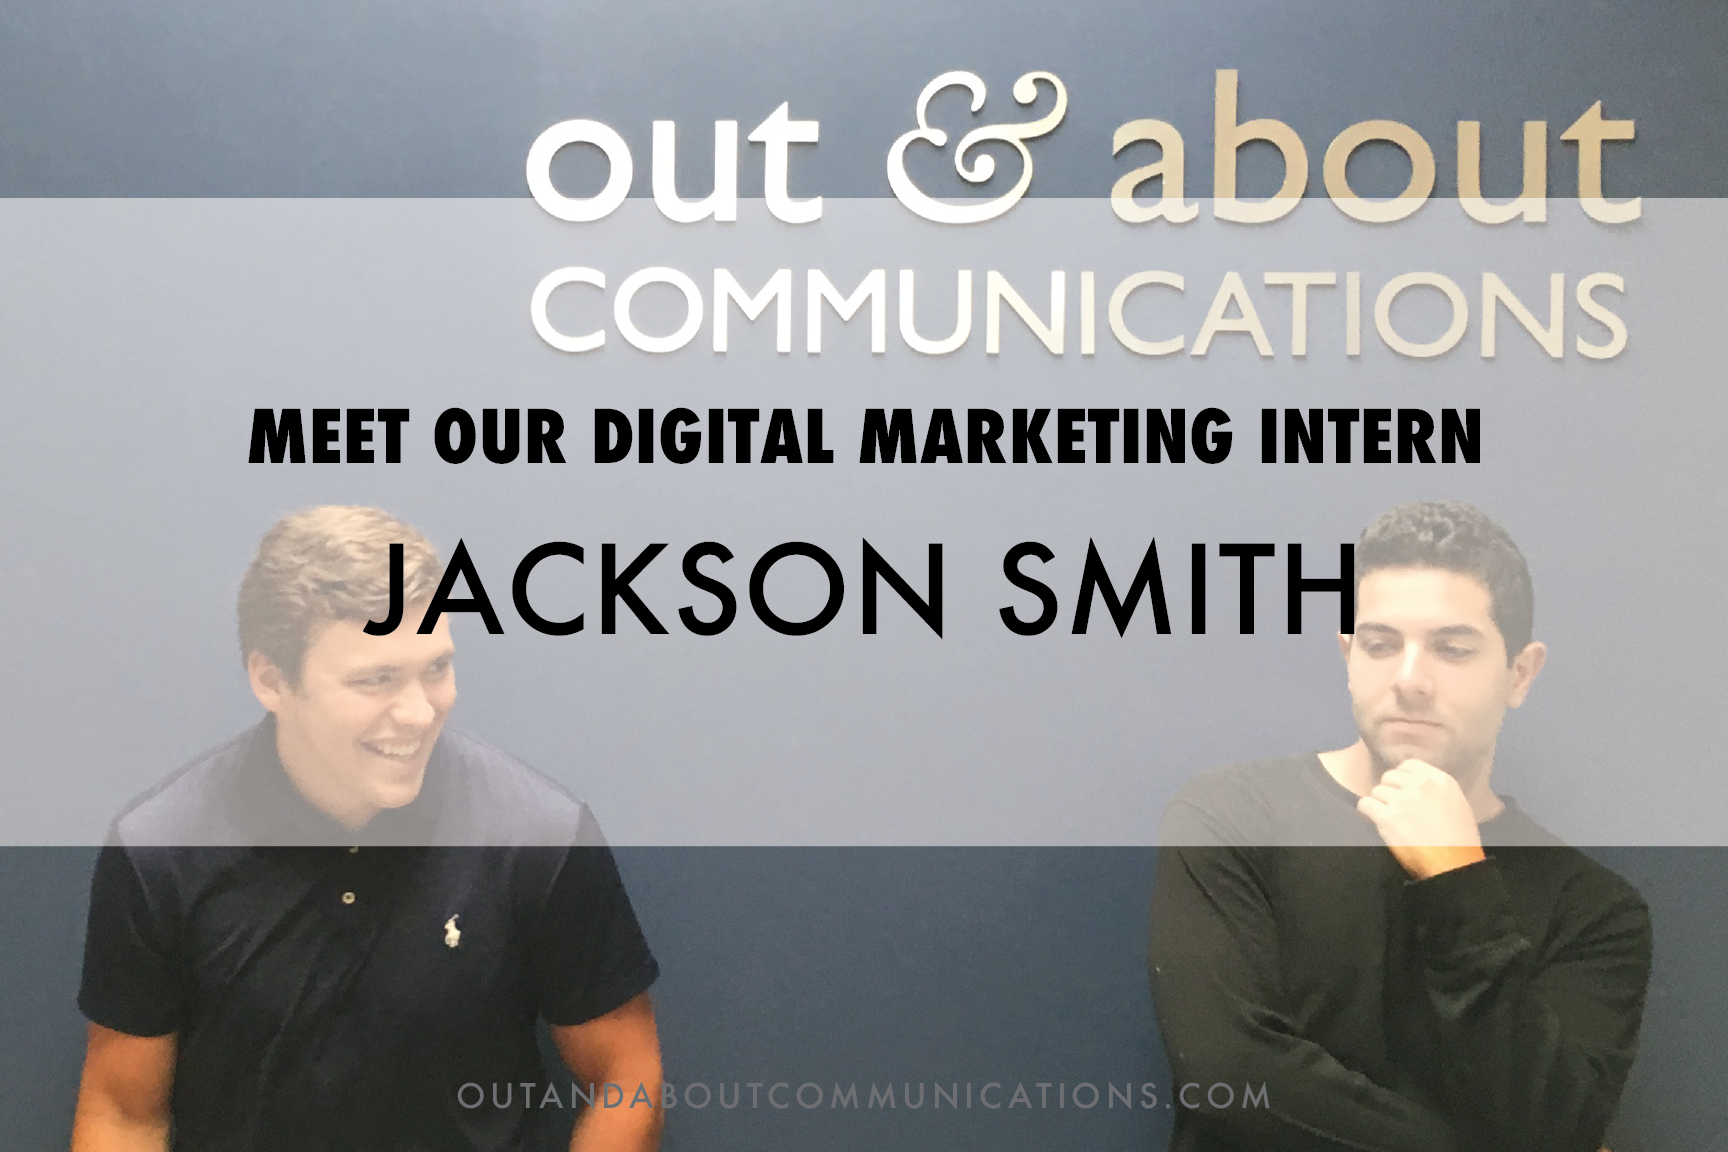 Meet Our Digital Marketing Intern, Jackson Smith